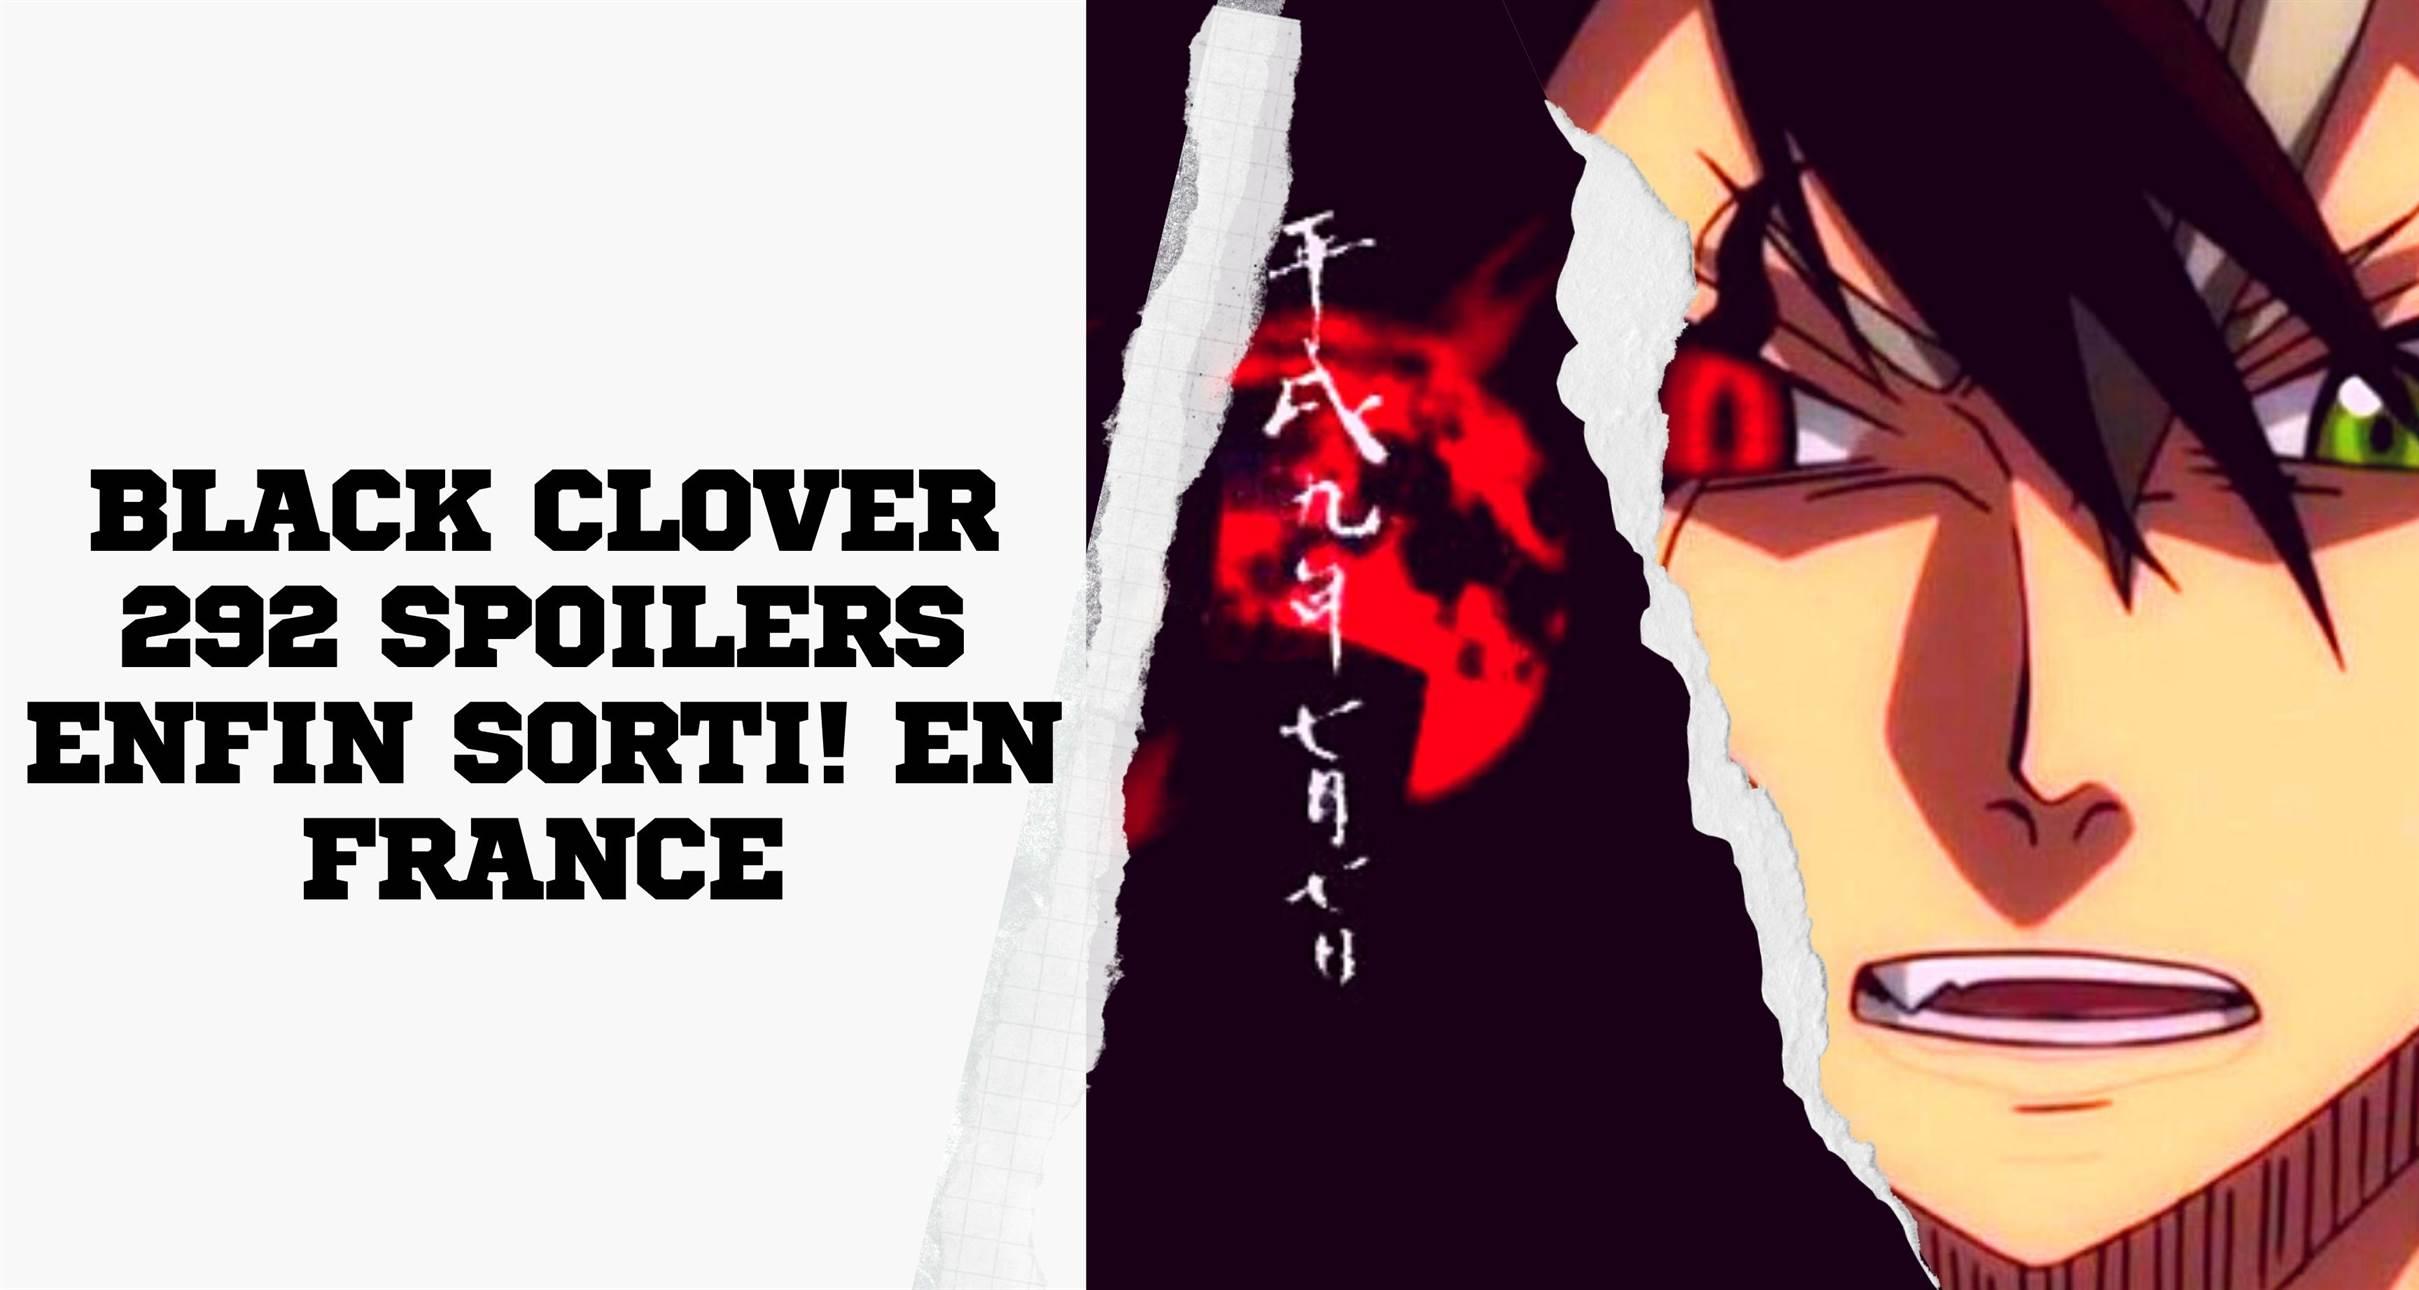 Black Clover 292 Spoilers